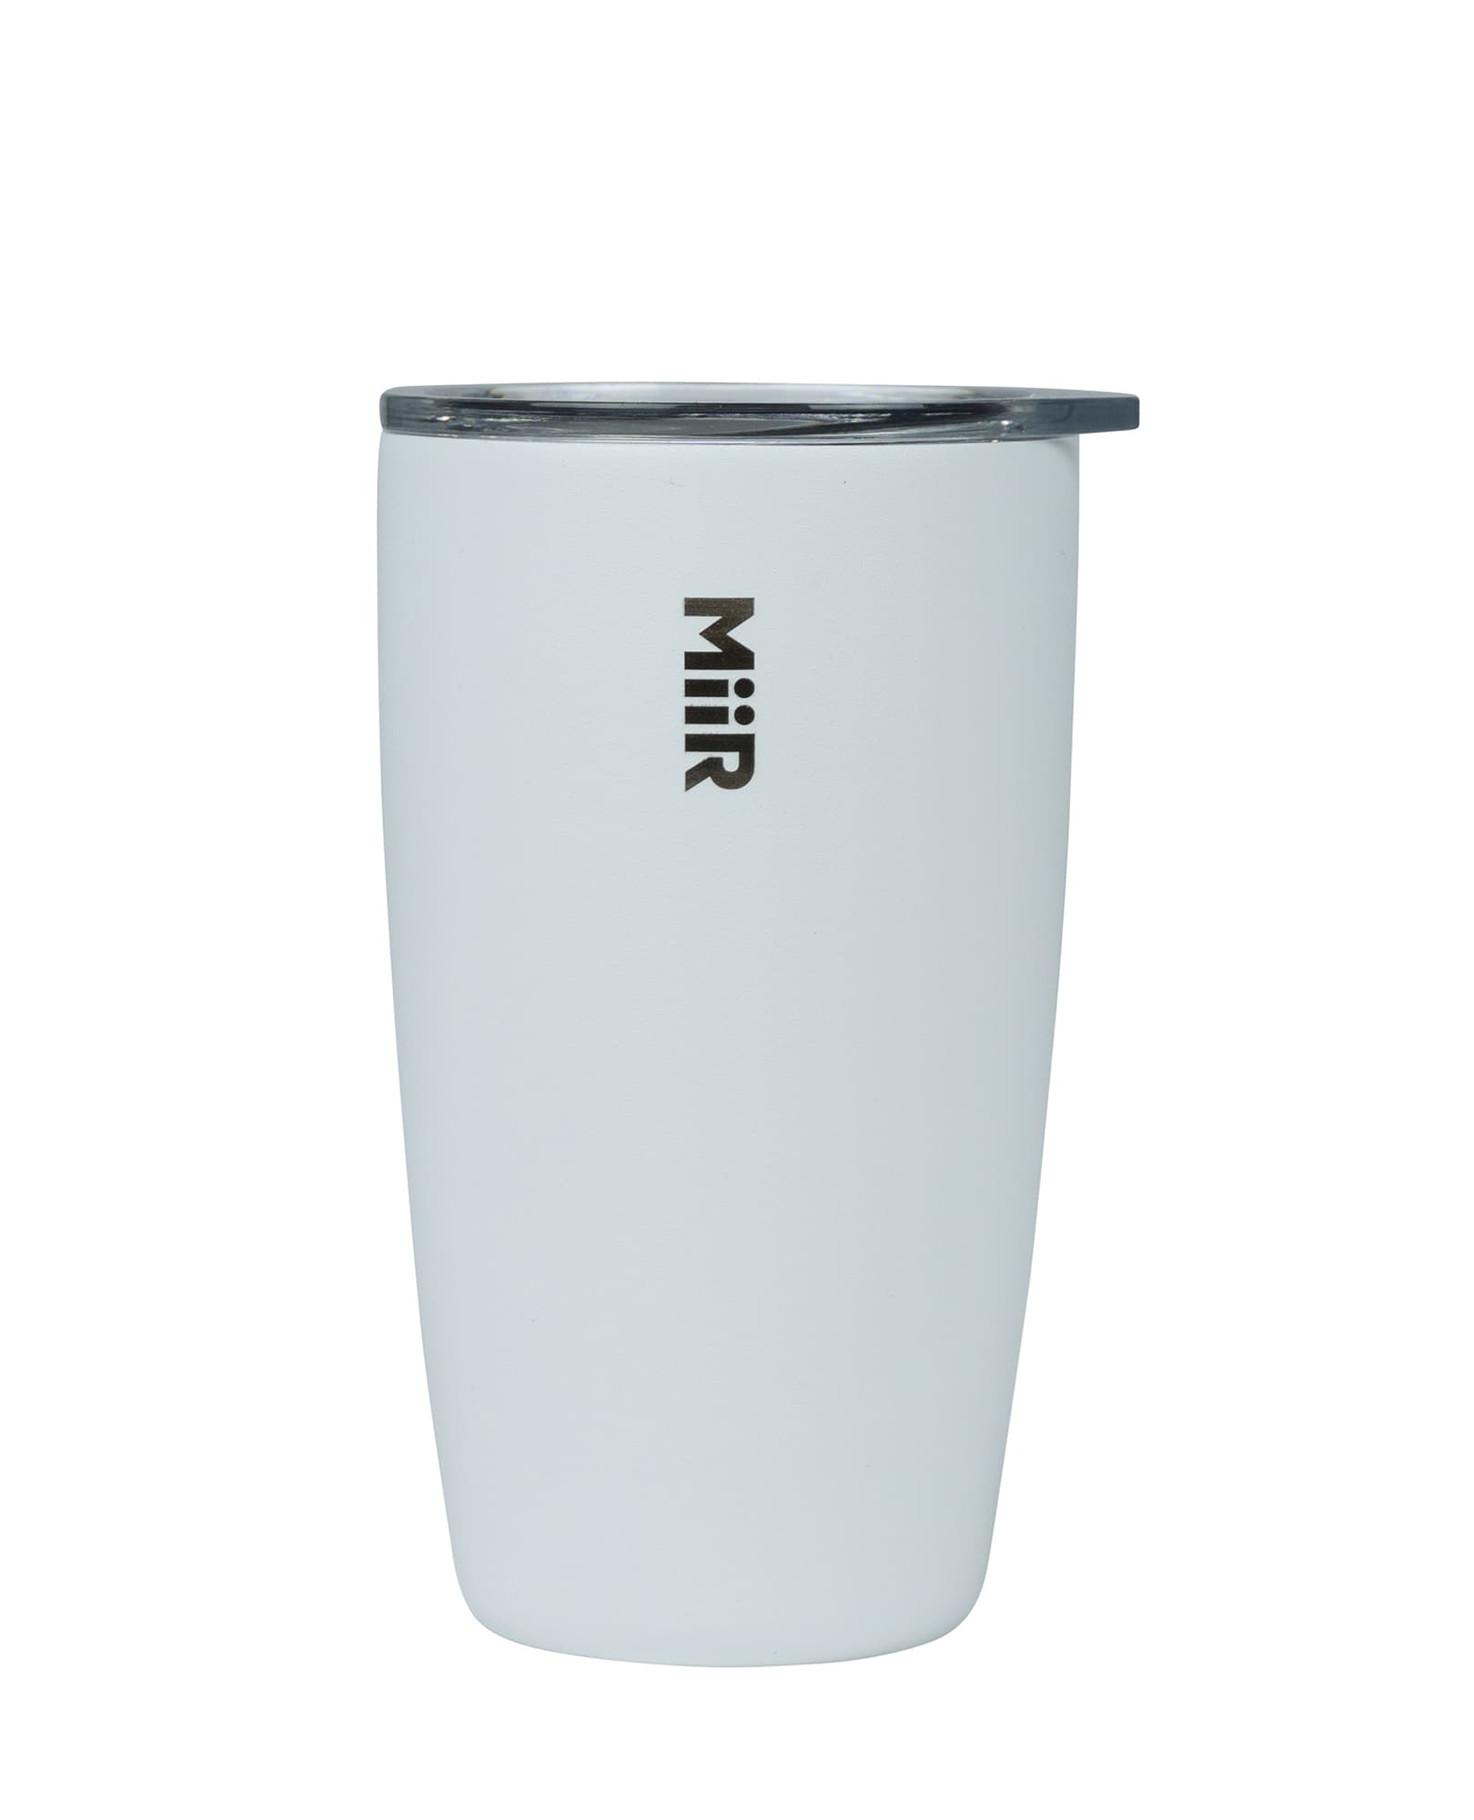 8 oz MiiR Mug, Free One Week Mugshare Checkout